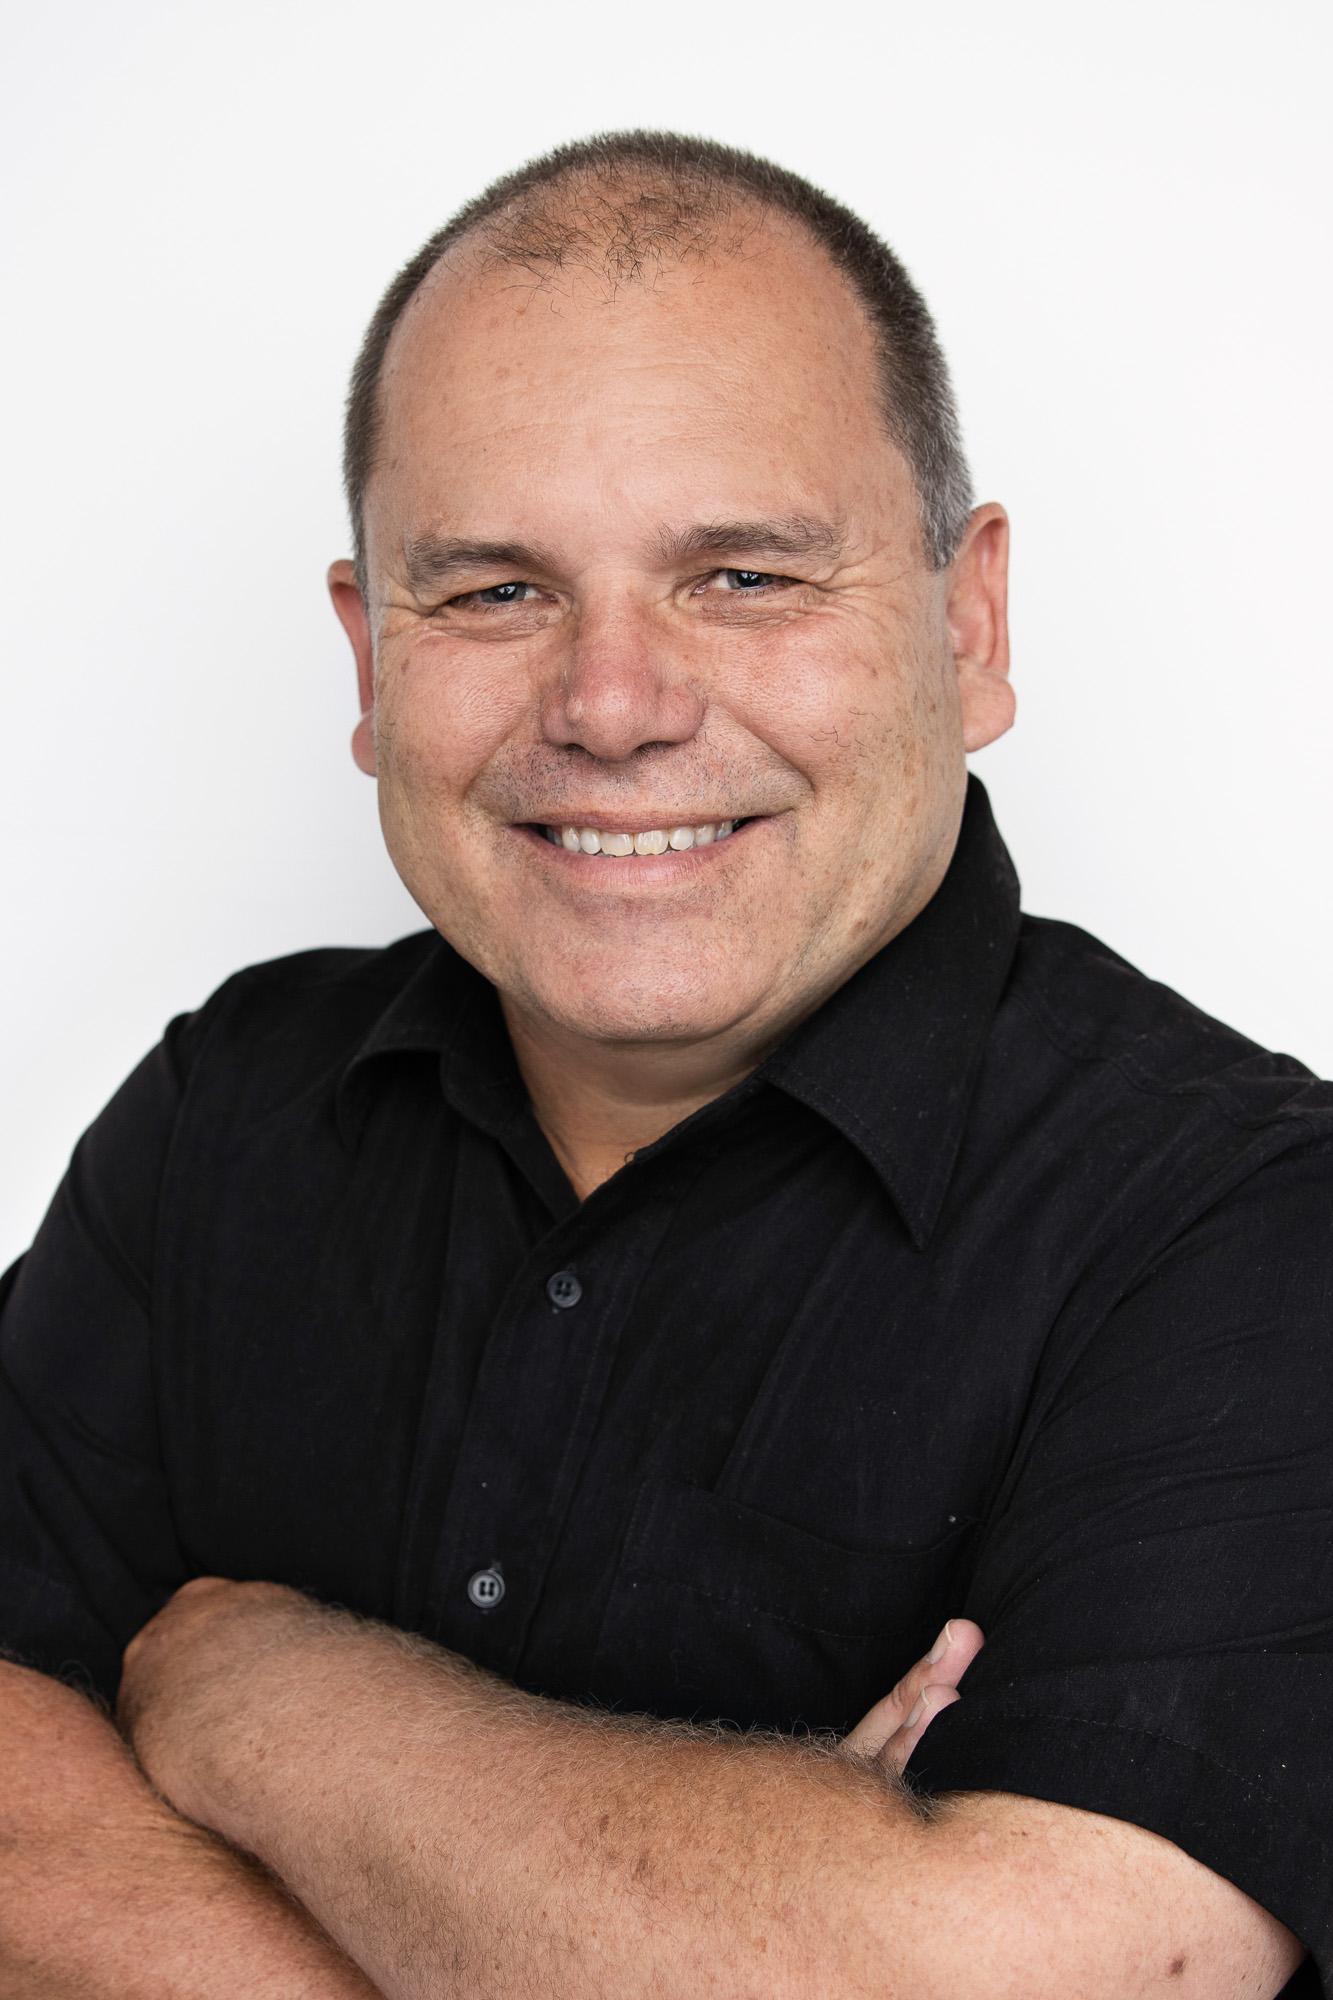 Michael Boldero